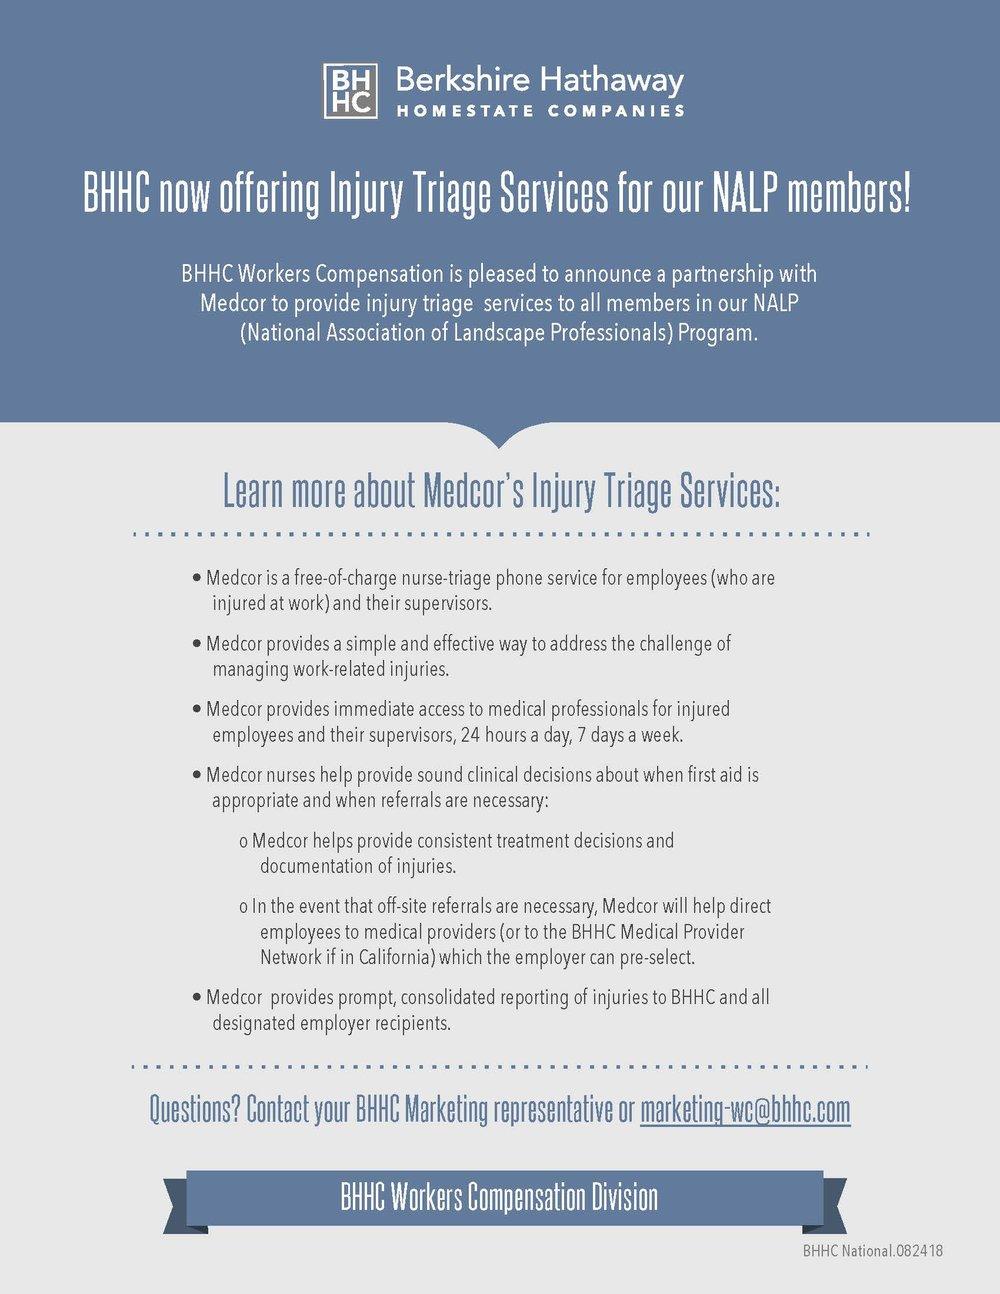 Injury Triage Services